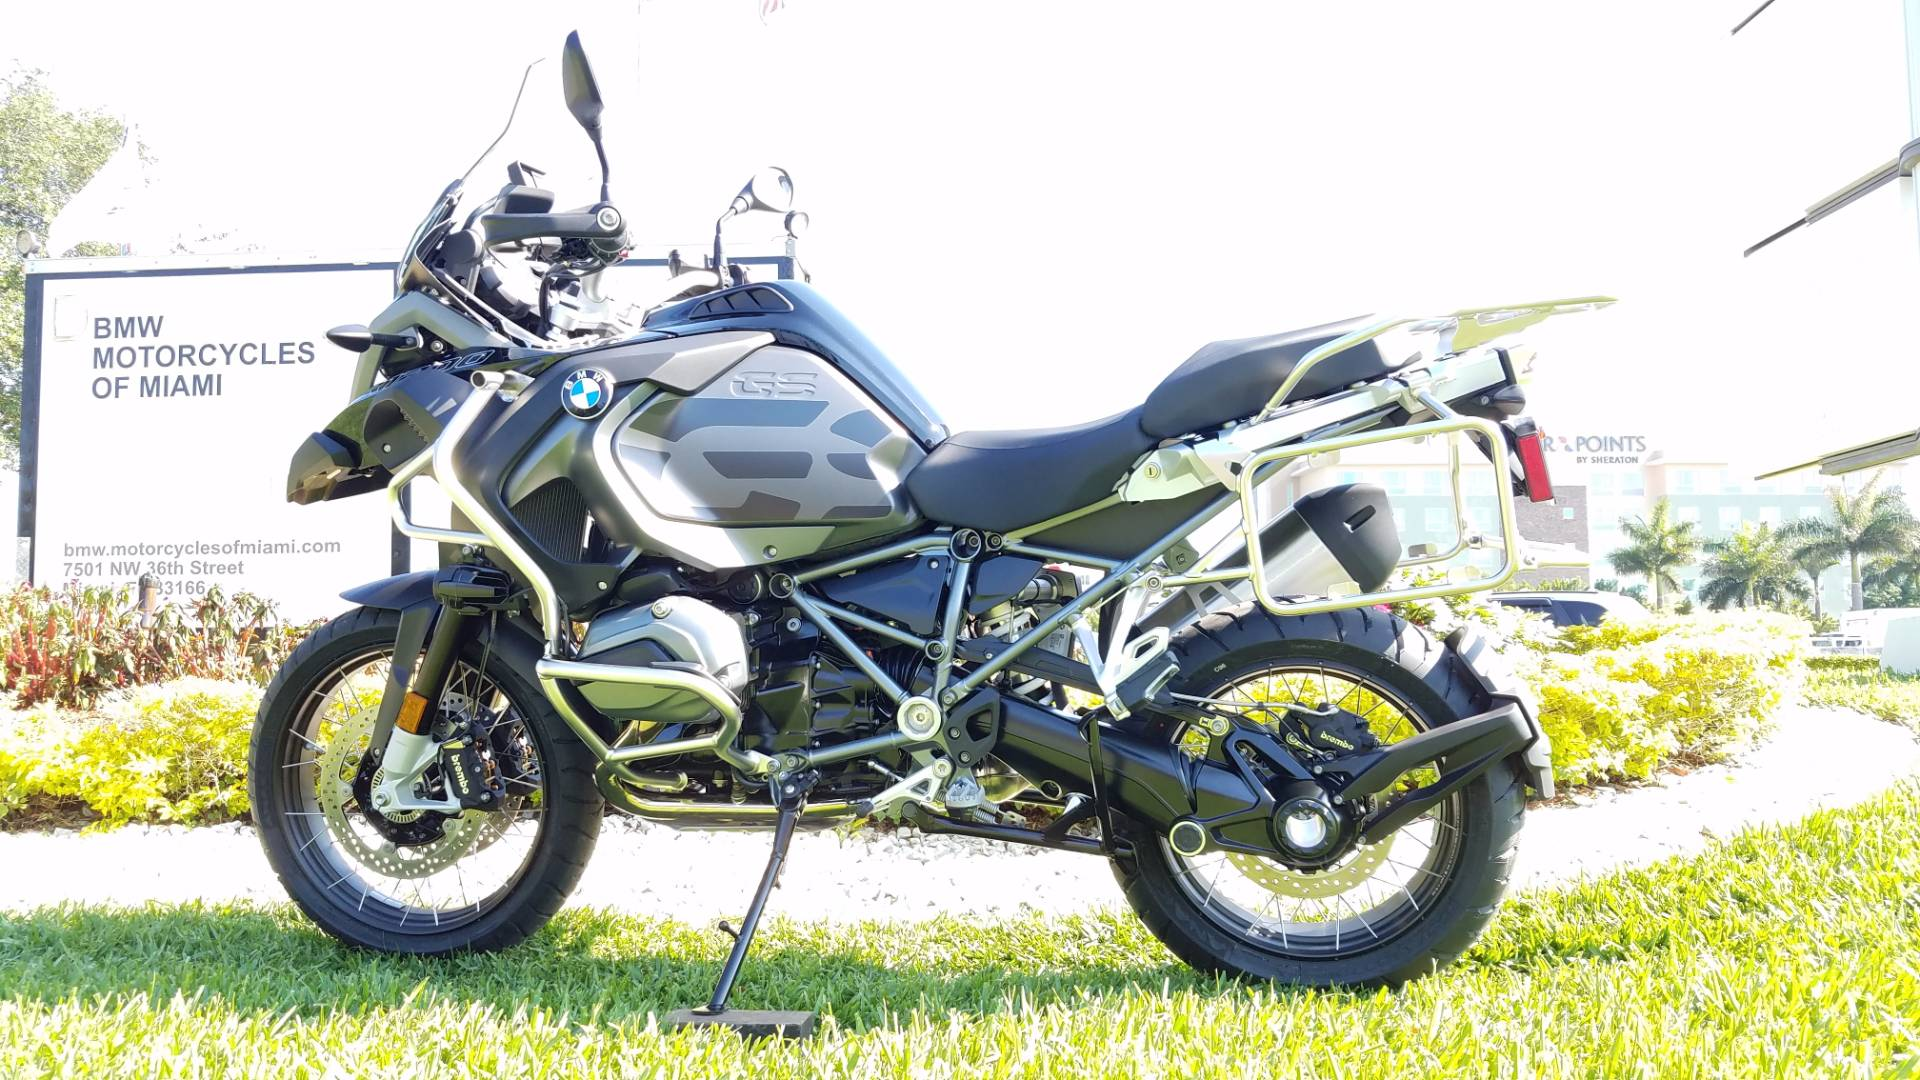 2017 R 1200 GS Adventure